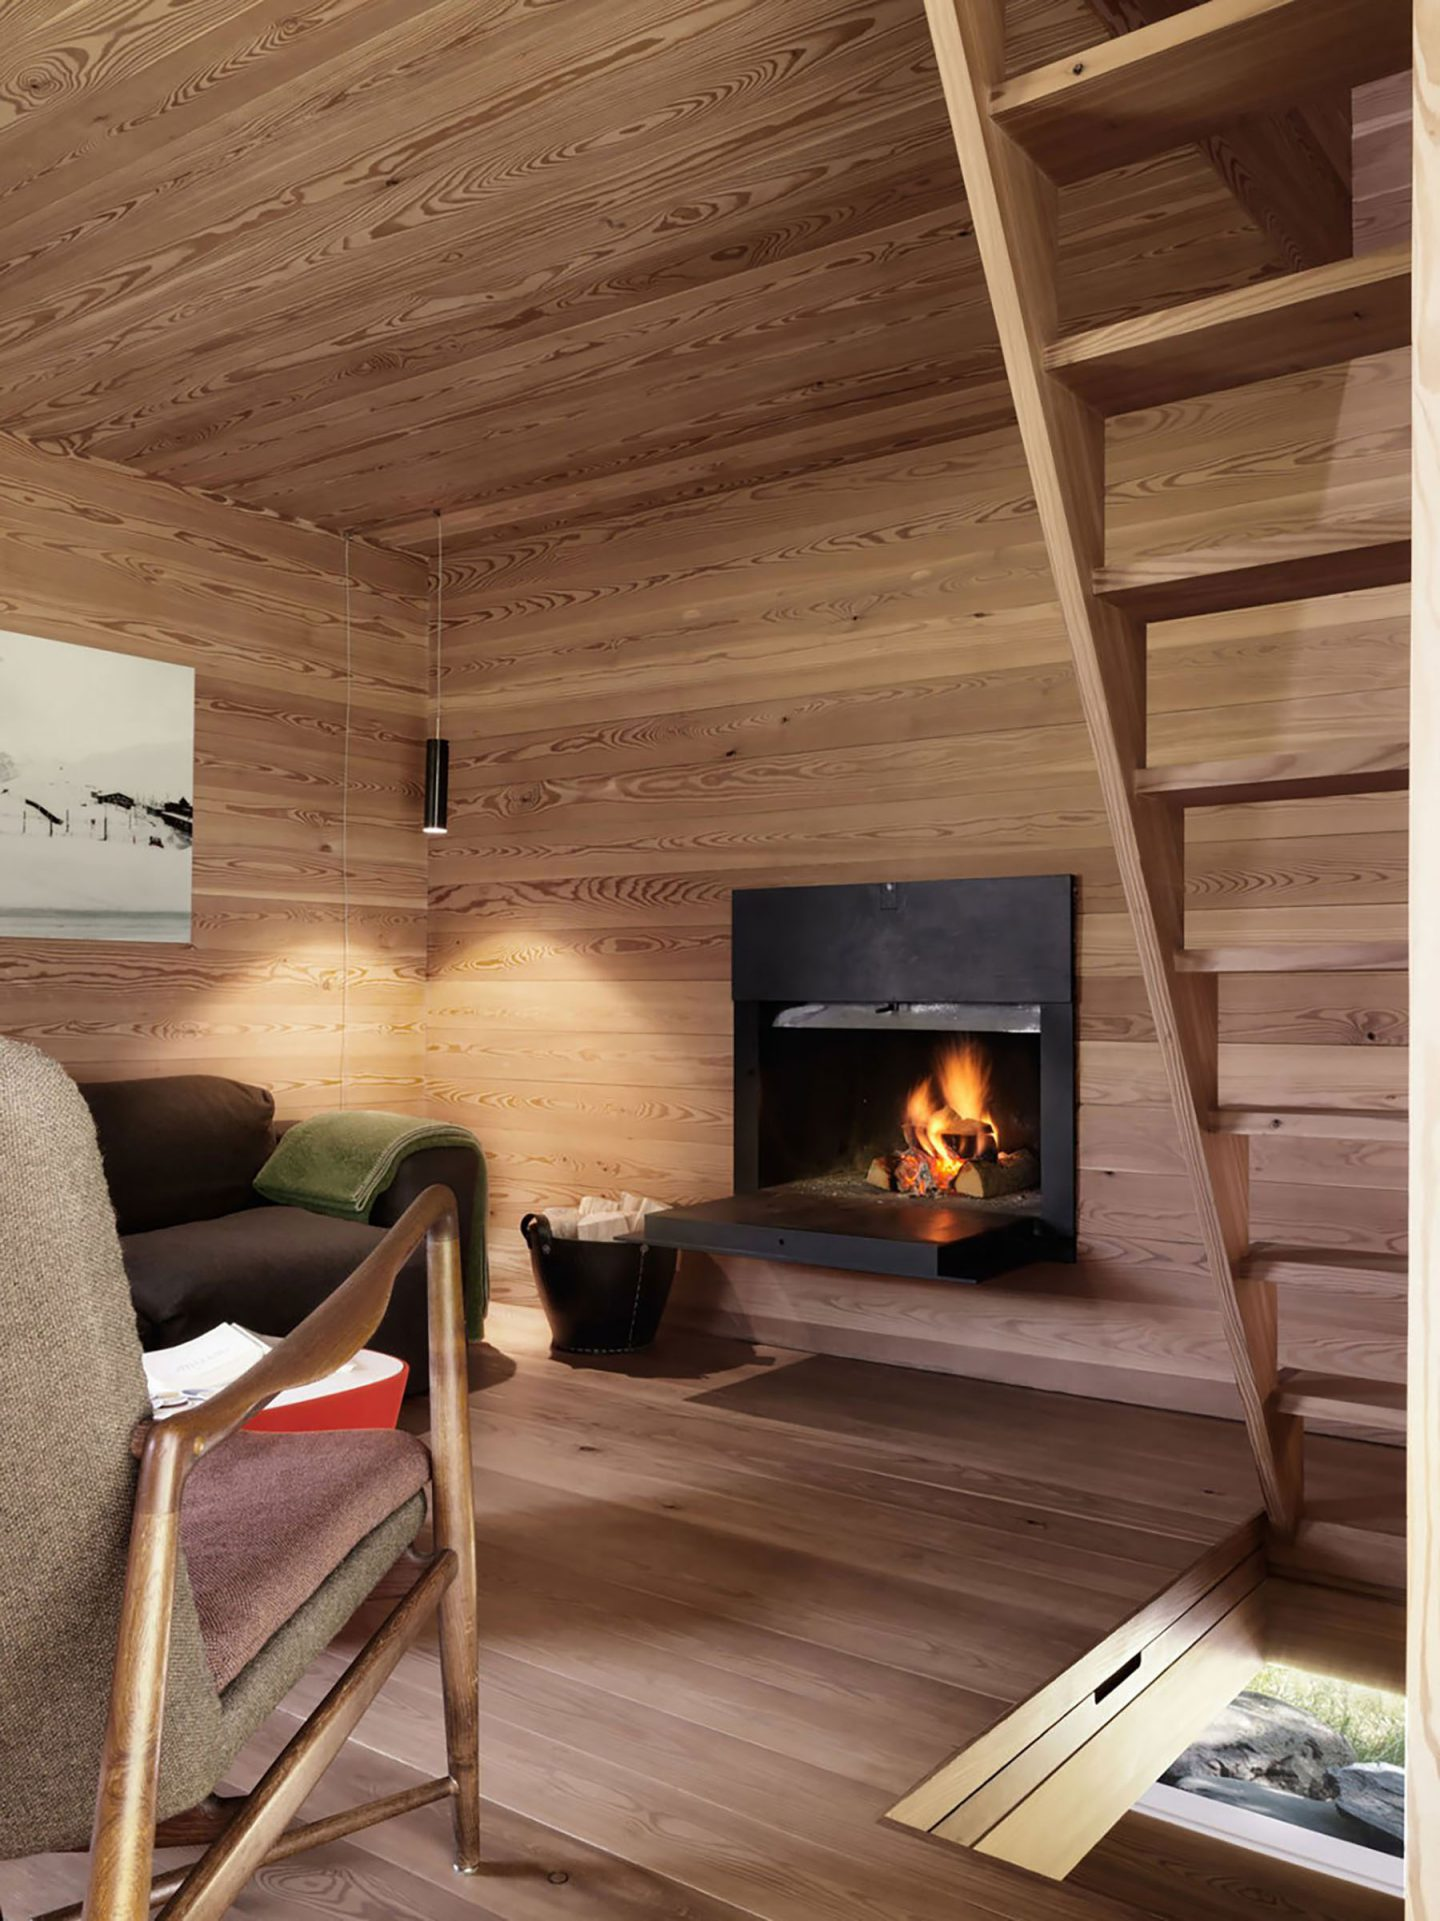 iGNANT-Architecture-Rapin-Saiz-Sarreyer-Cabin-25